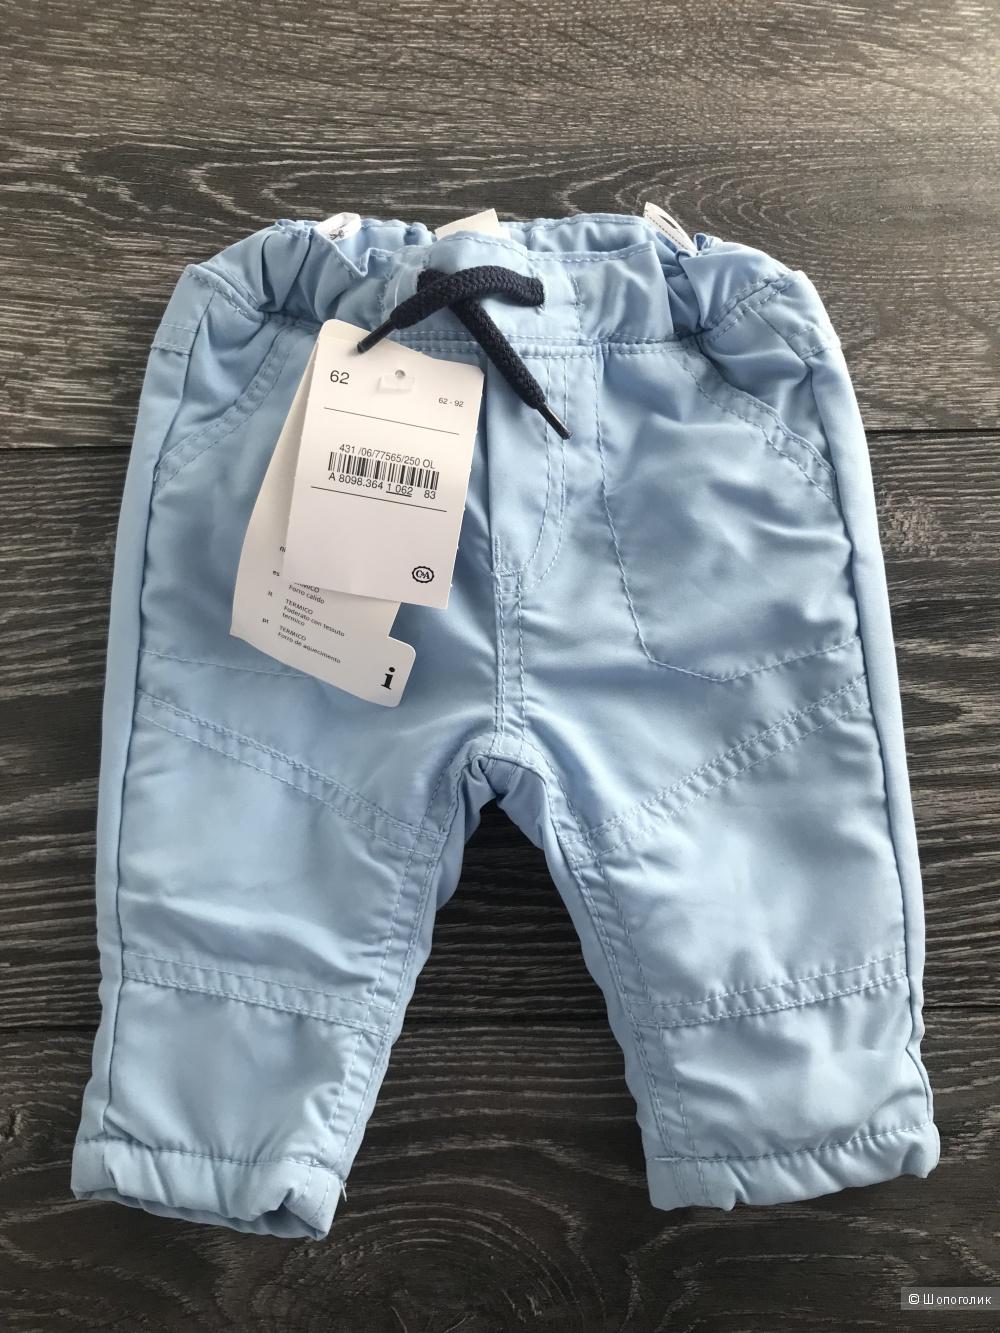 Тёплые штаны для мальчика c&a 62р